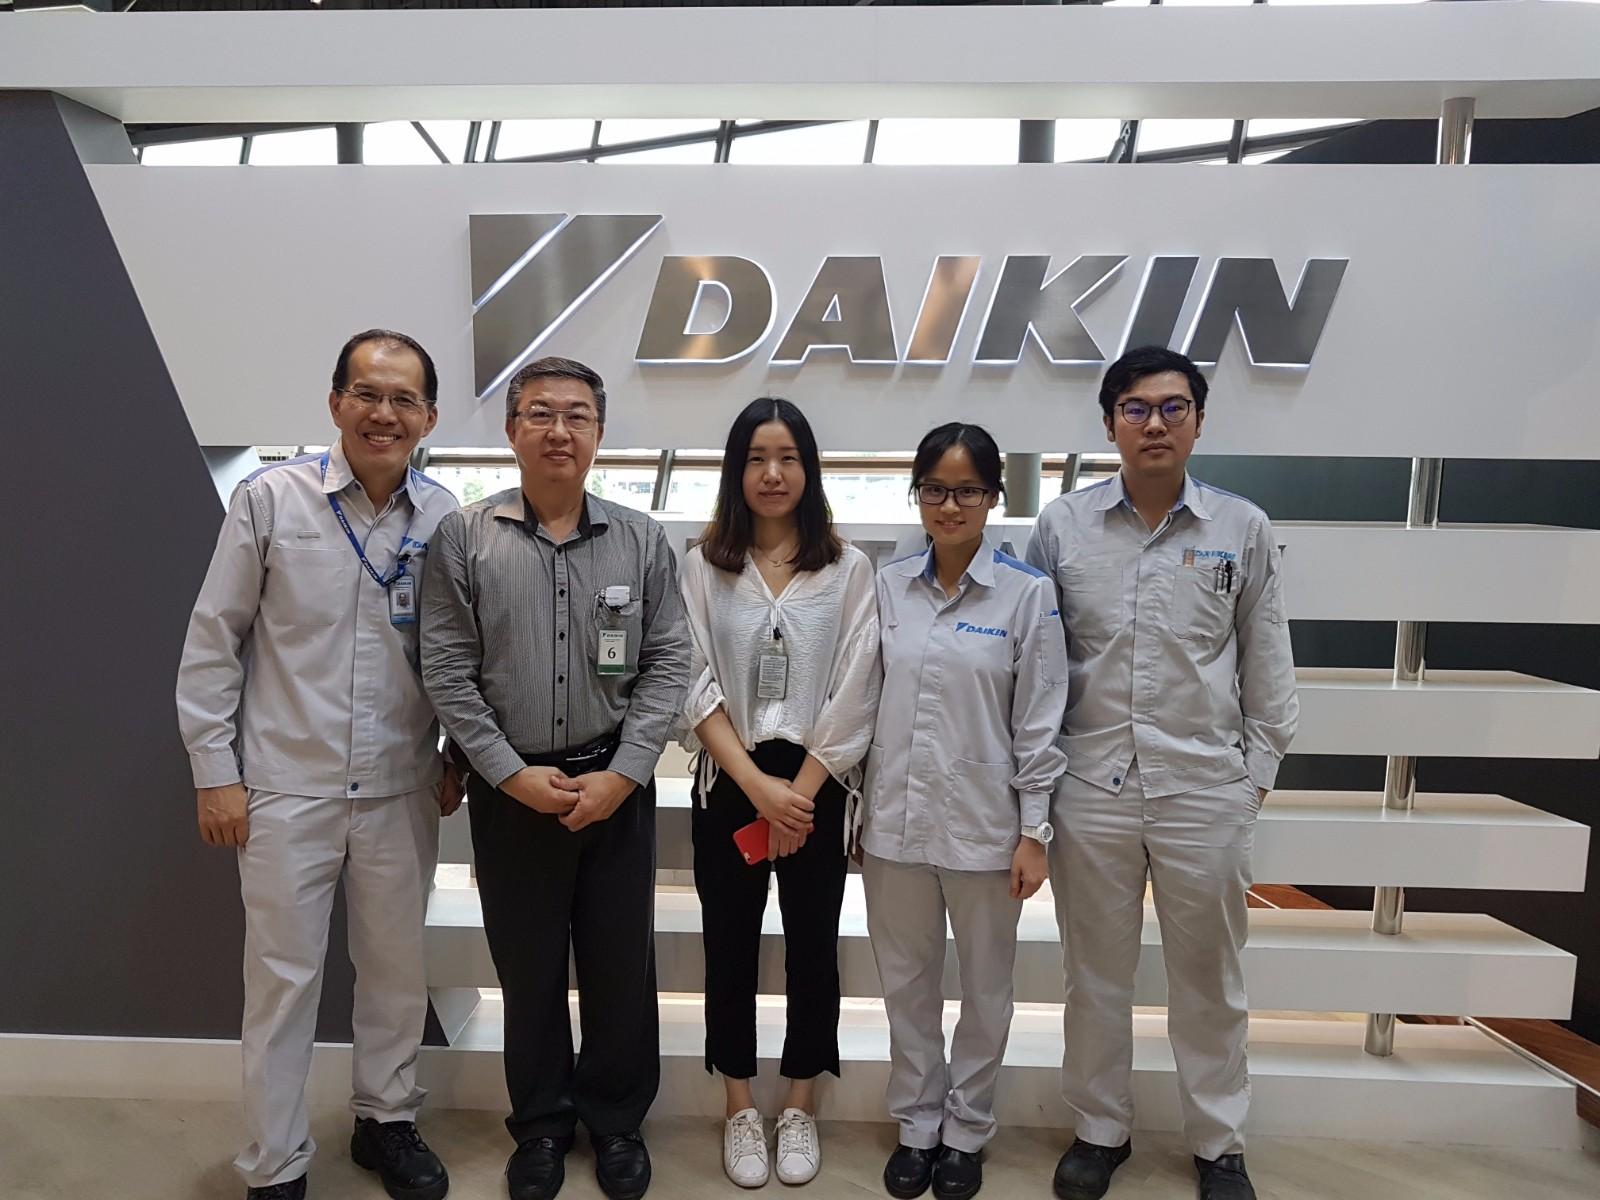 Daikin Malaysia Sdn. Bhd. Factory Visit On 20-9-2017